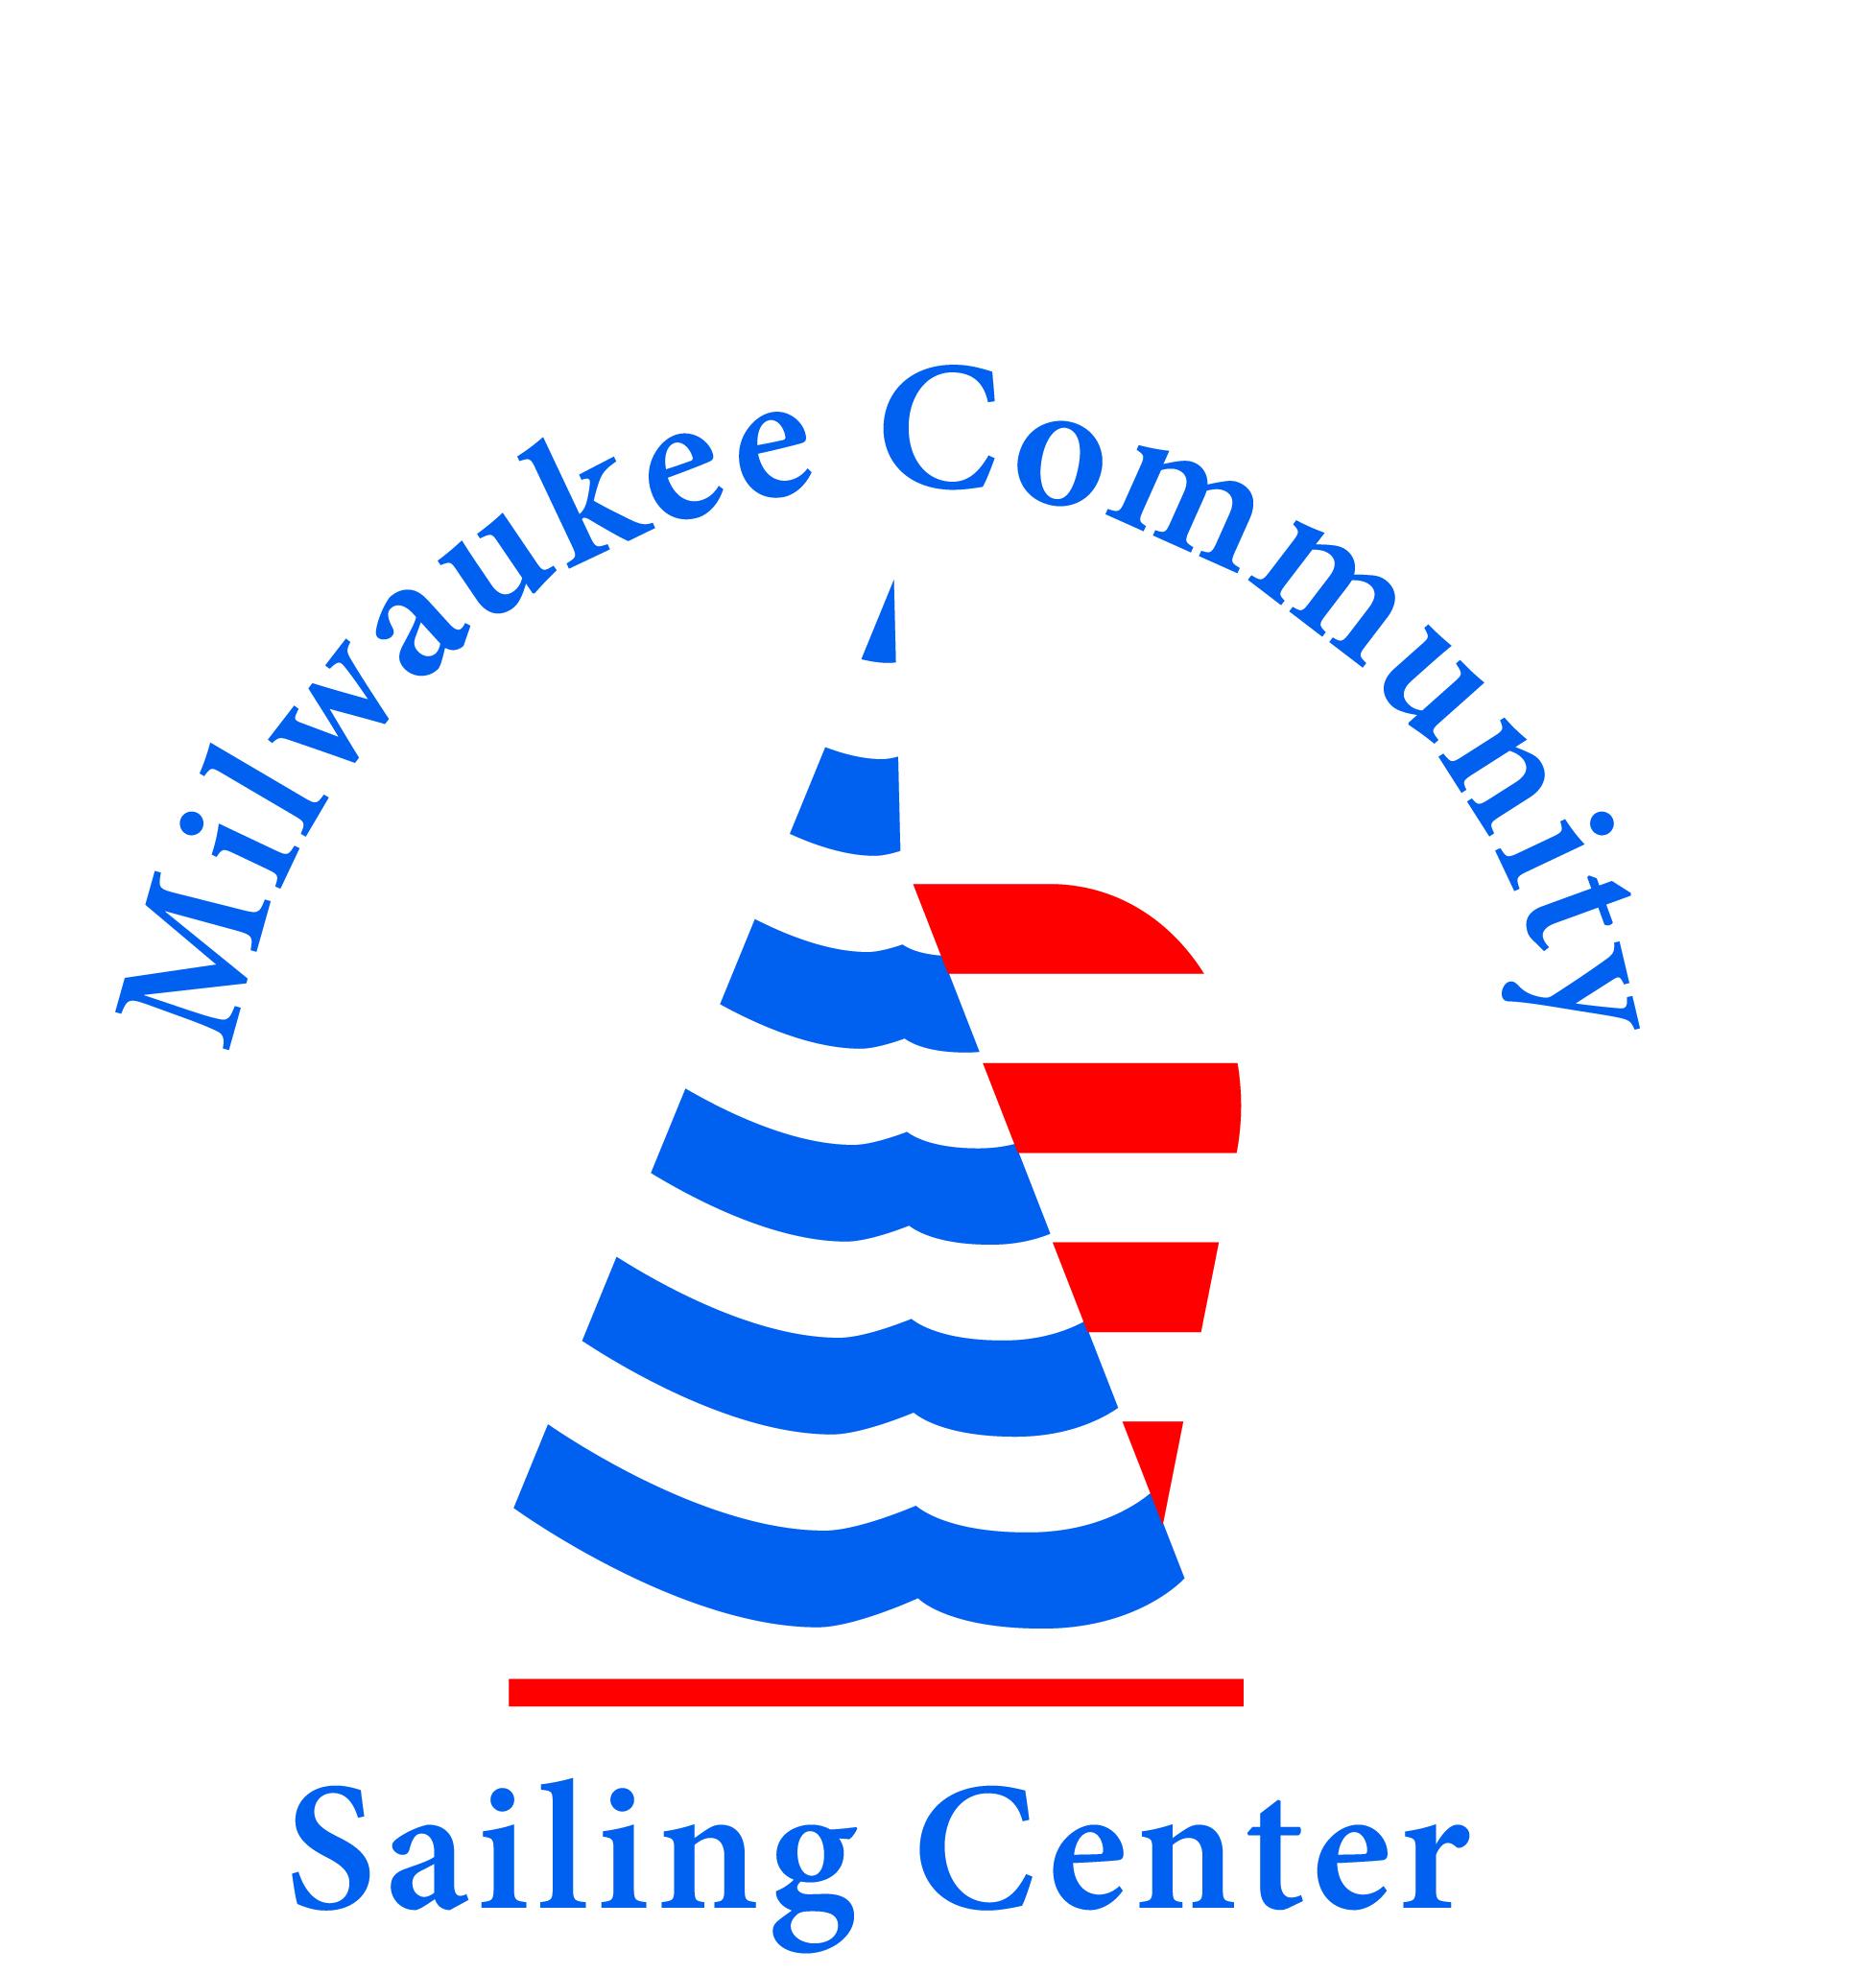 Milwaukee Community Sailing Center